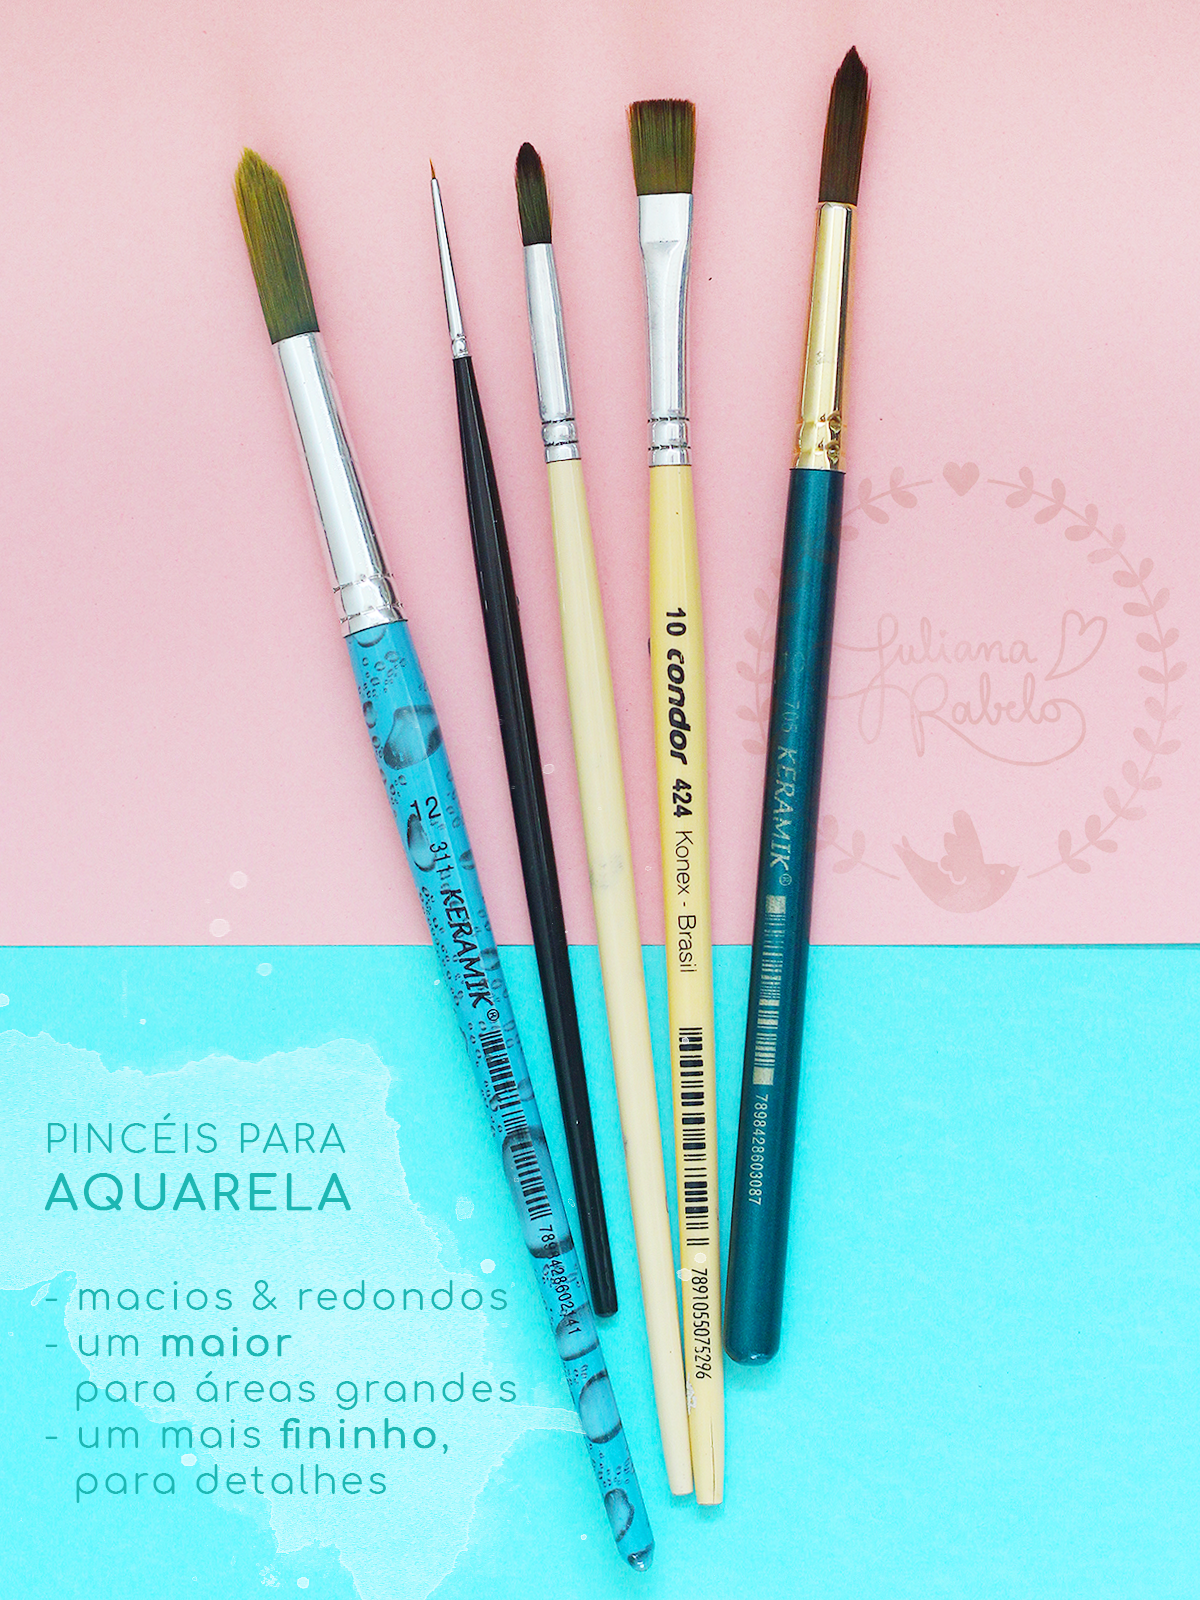 kit de aquarela para iniciantes - Juliana Rabelo